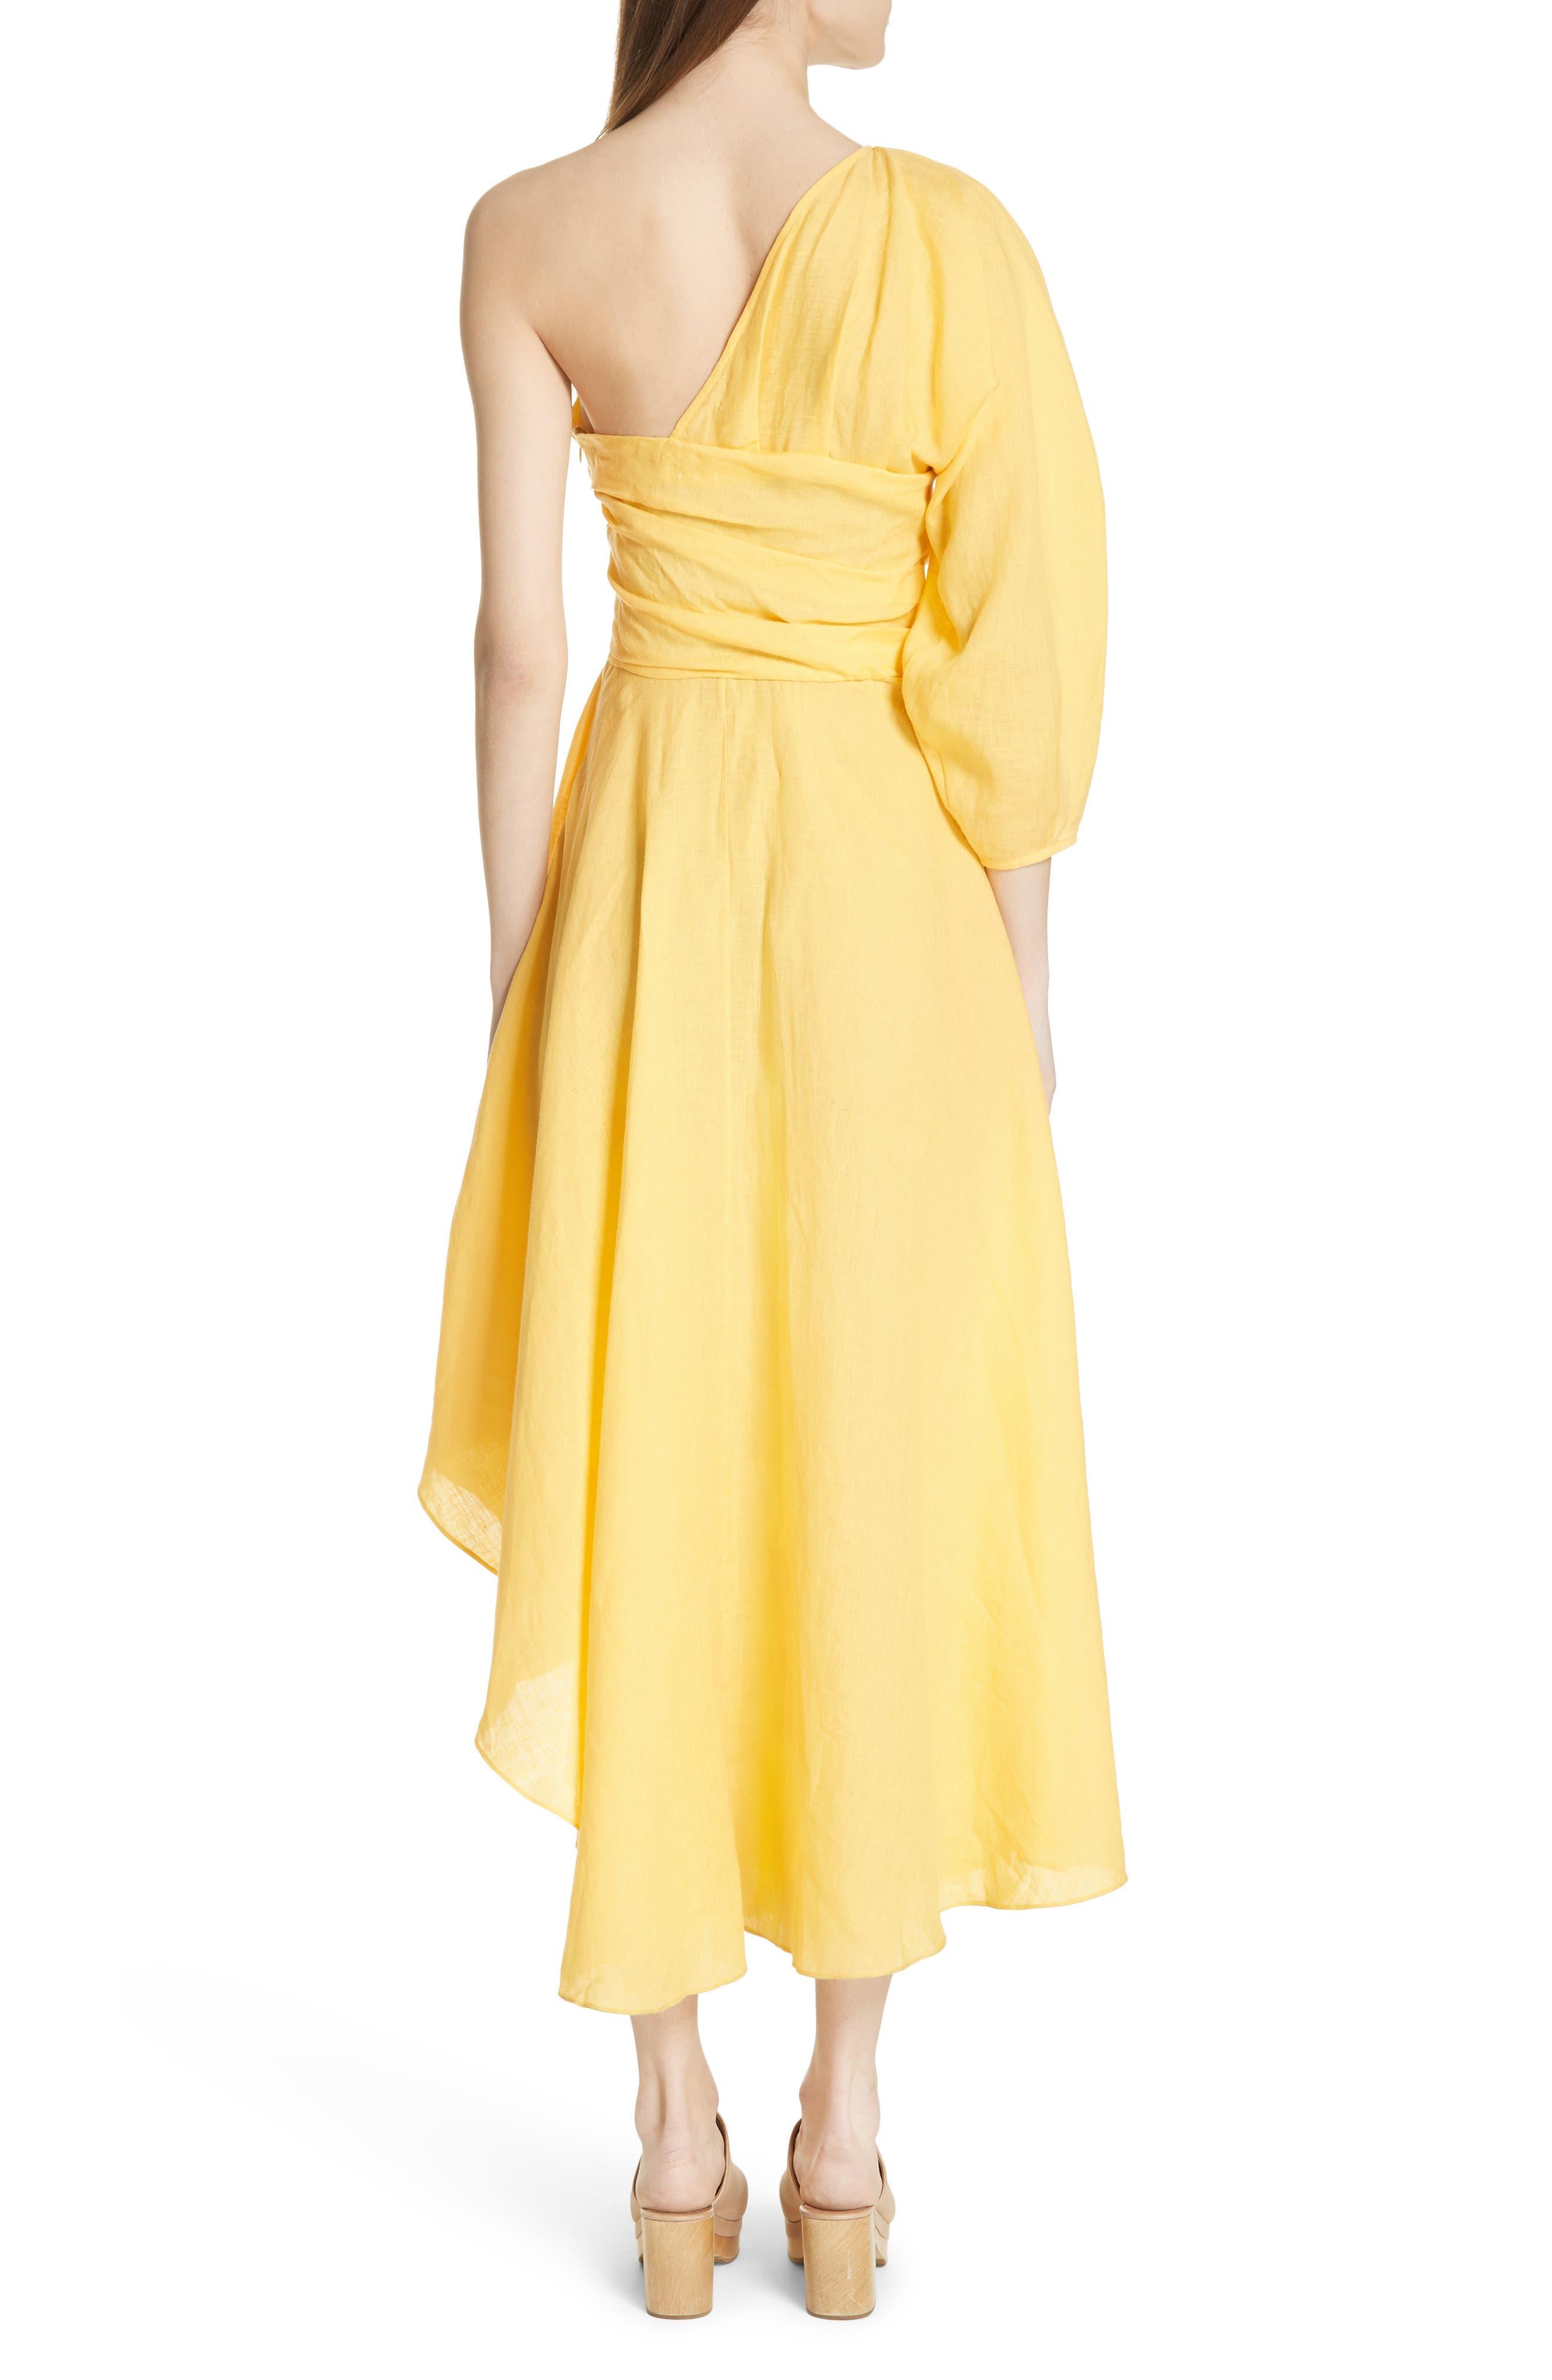 Tipple One-Shoulder Dress,                             Alternate thumbnail 2, color,                             YELLOW